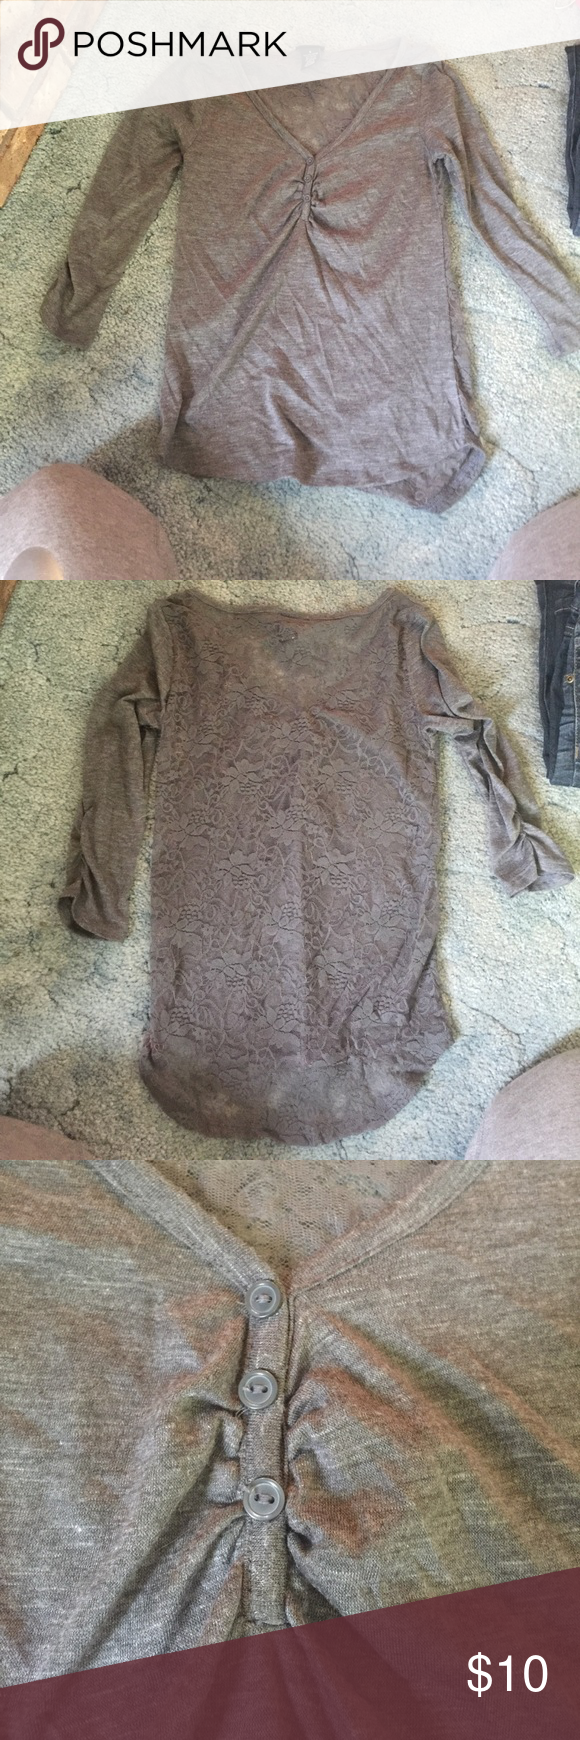 Lace back 3/4 sleeve Grey lace back 3/4 sleeve tee Rue 21 Tops Tees - Long Sleeve